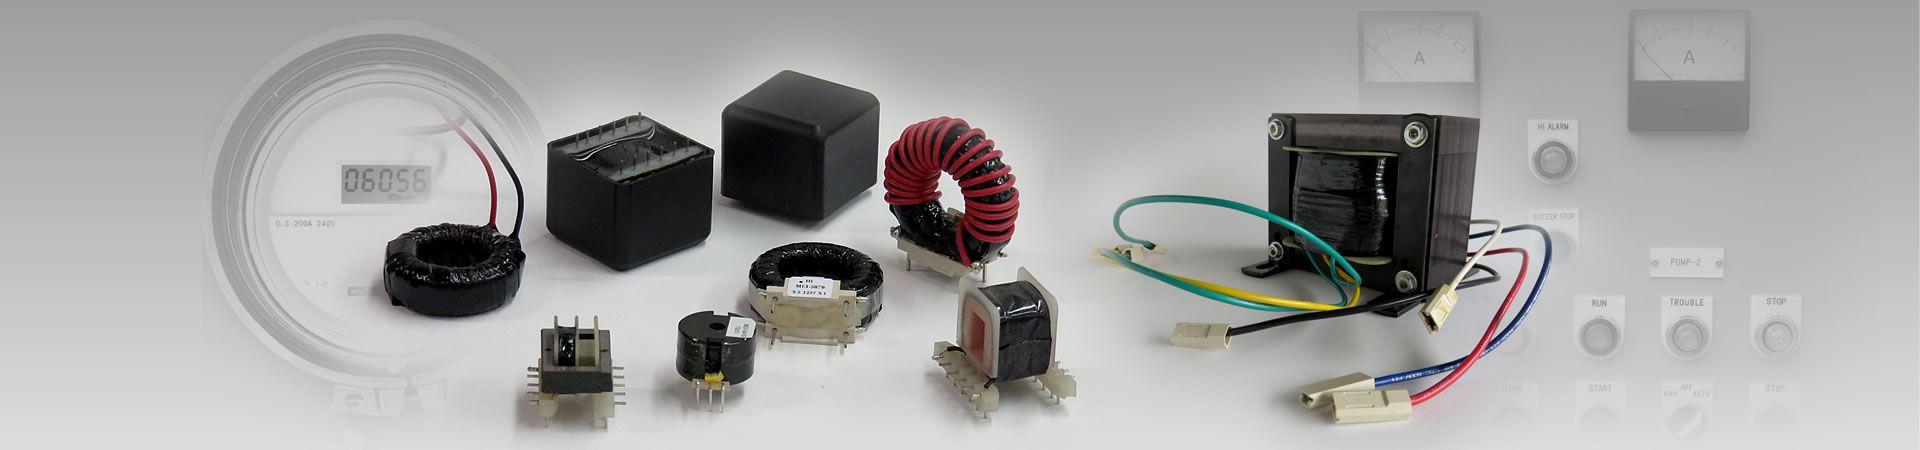 Electrical Transformers & Coils OEM & Custom Mci Limited Waterloo